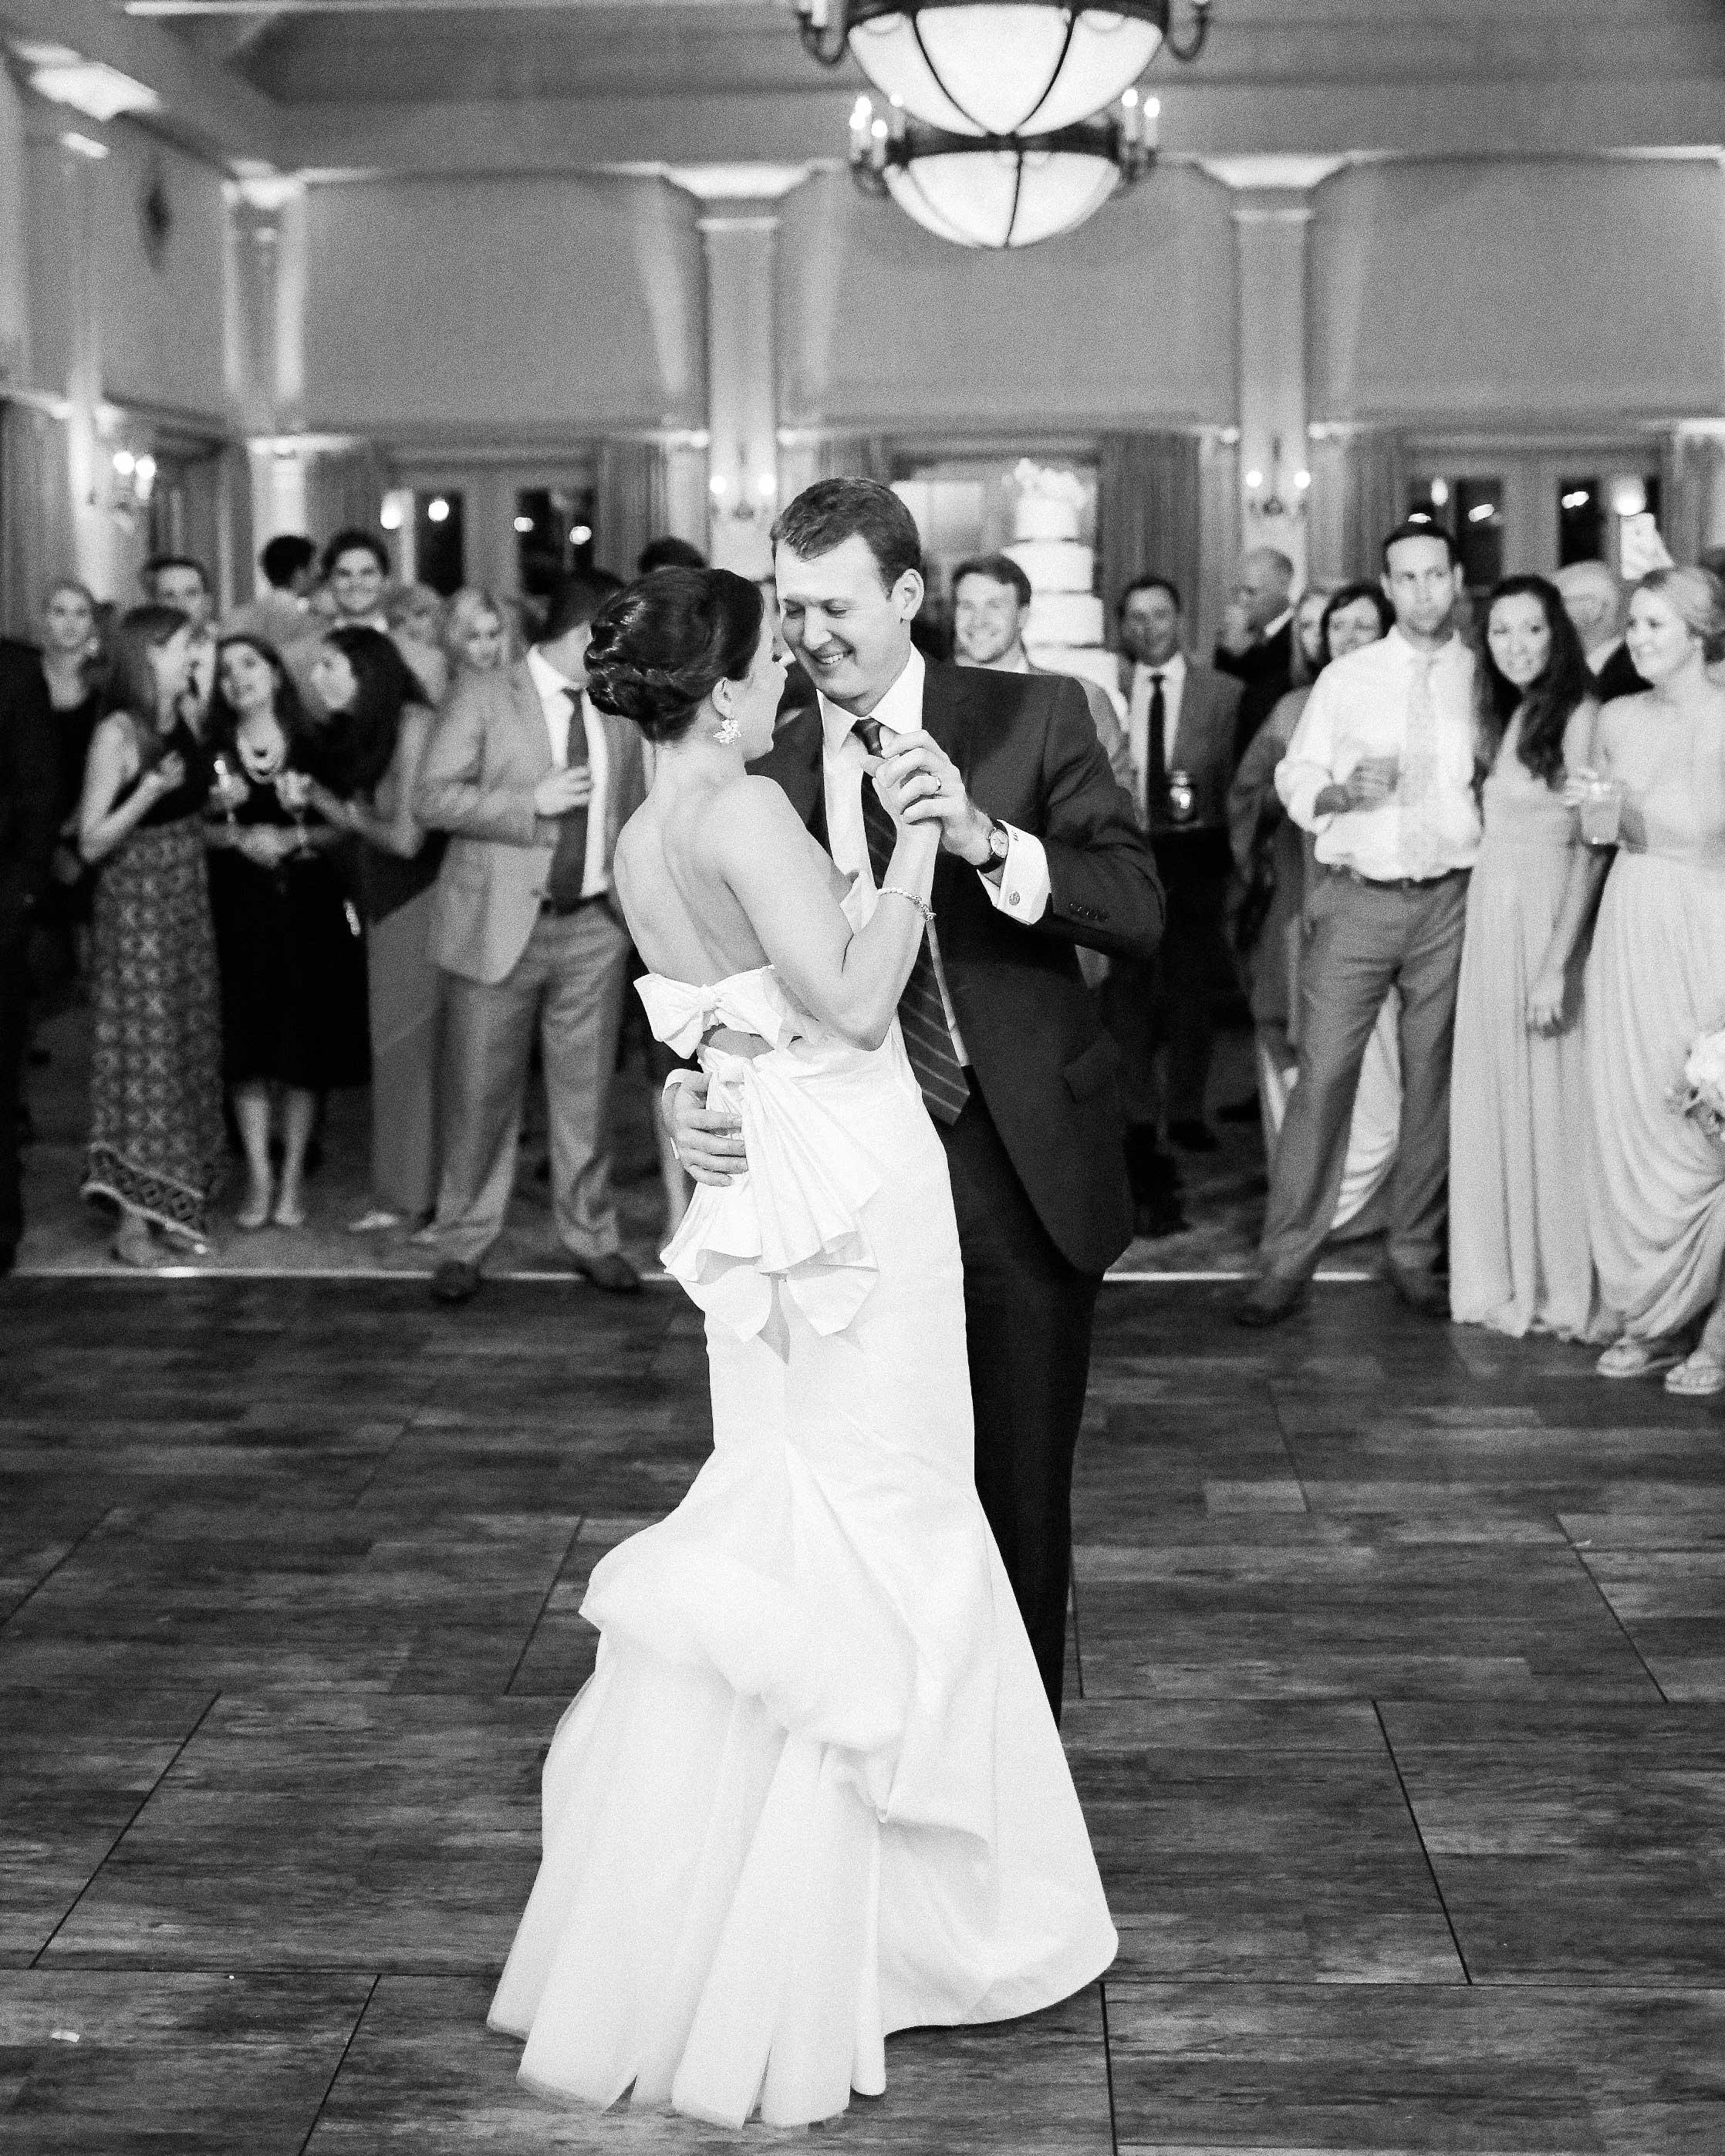 taylor-john-wedding-first-dance-53-s113035-0616.jpg